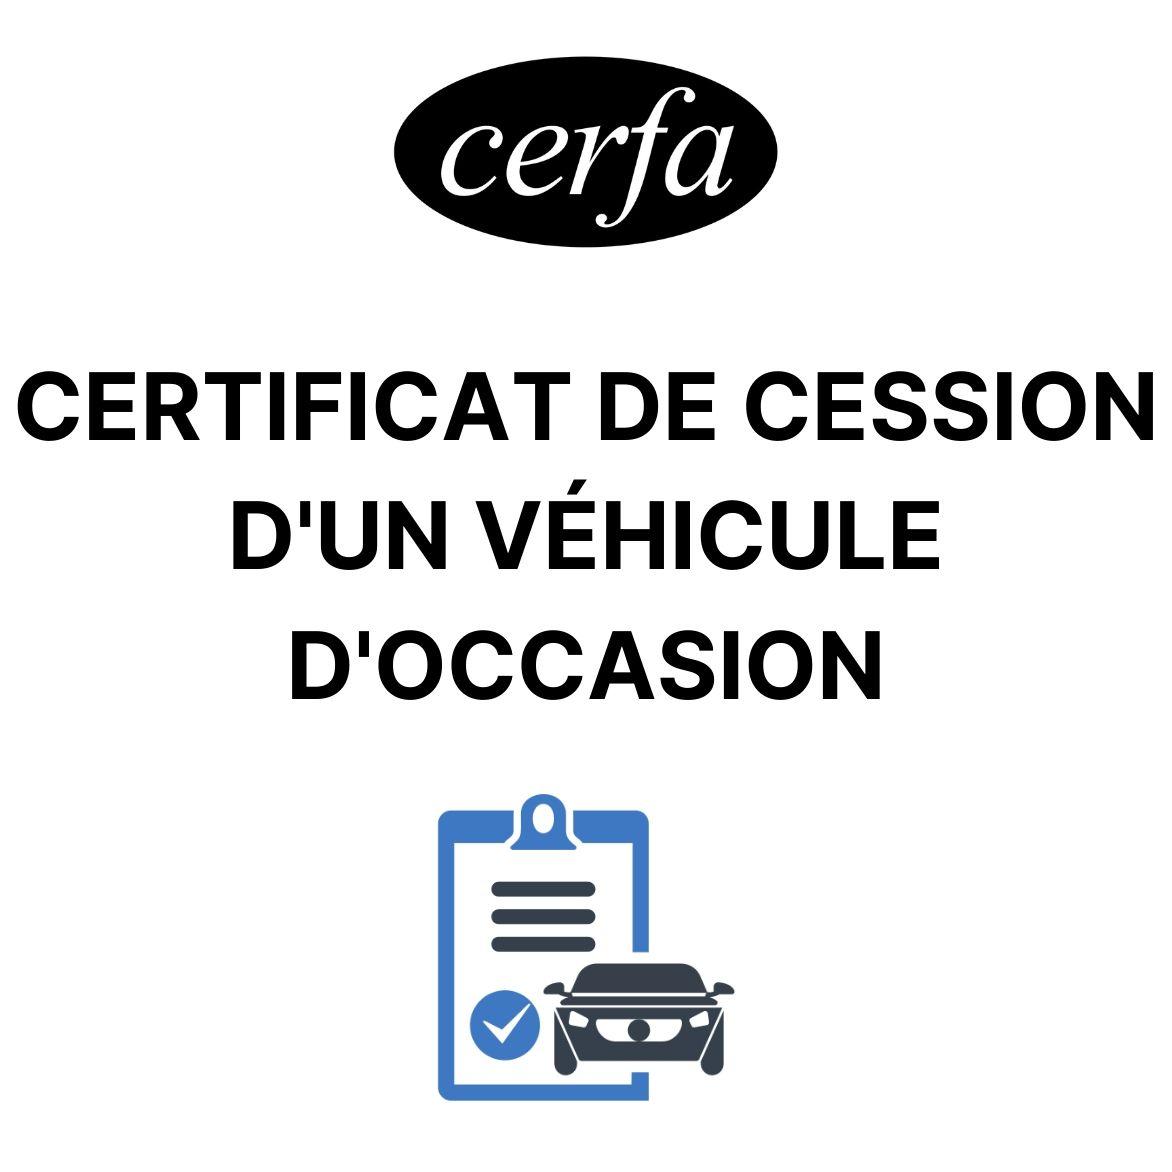 CERFA CESSION VEHICULE OCCASION